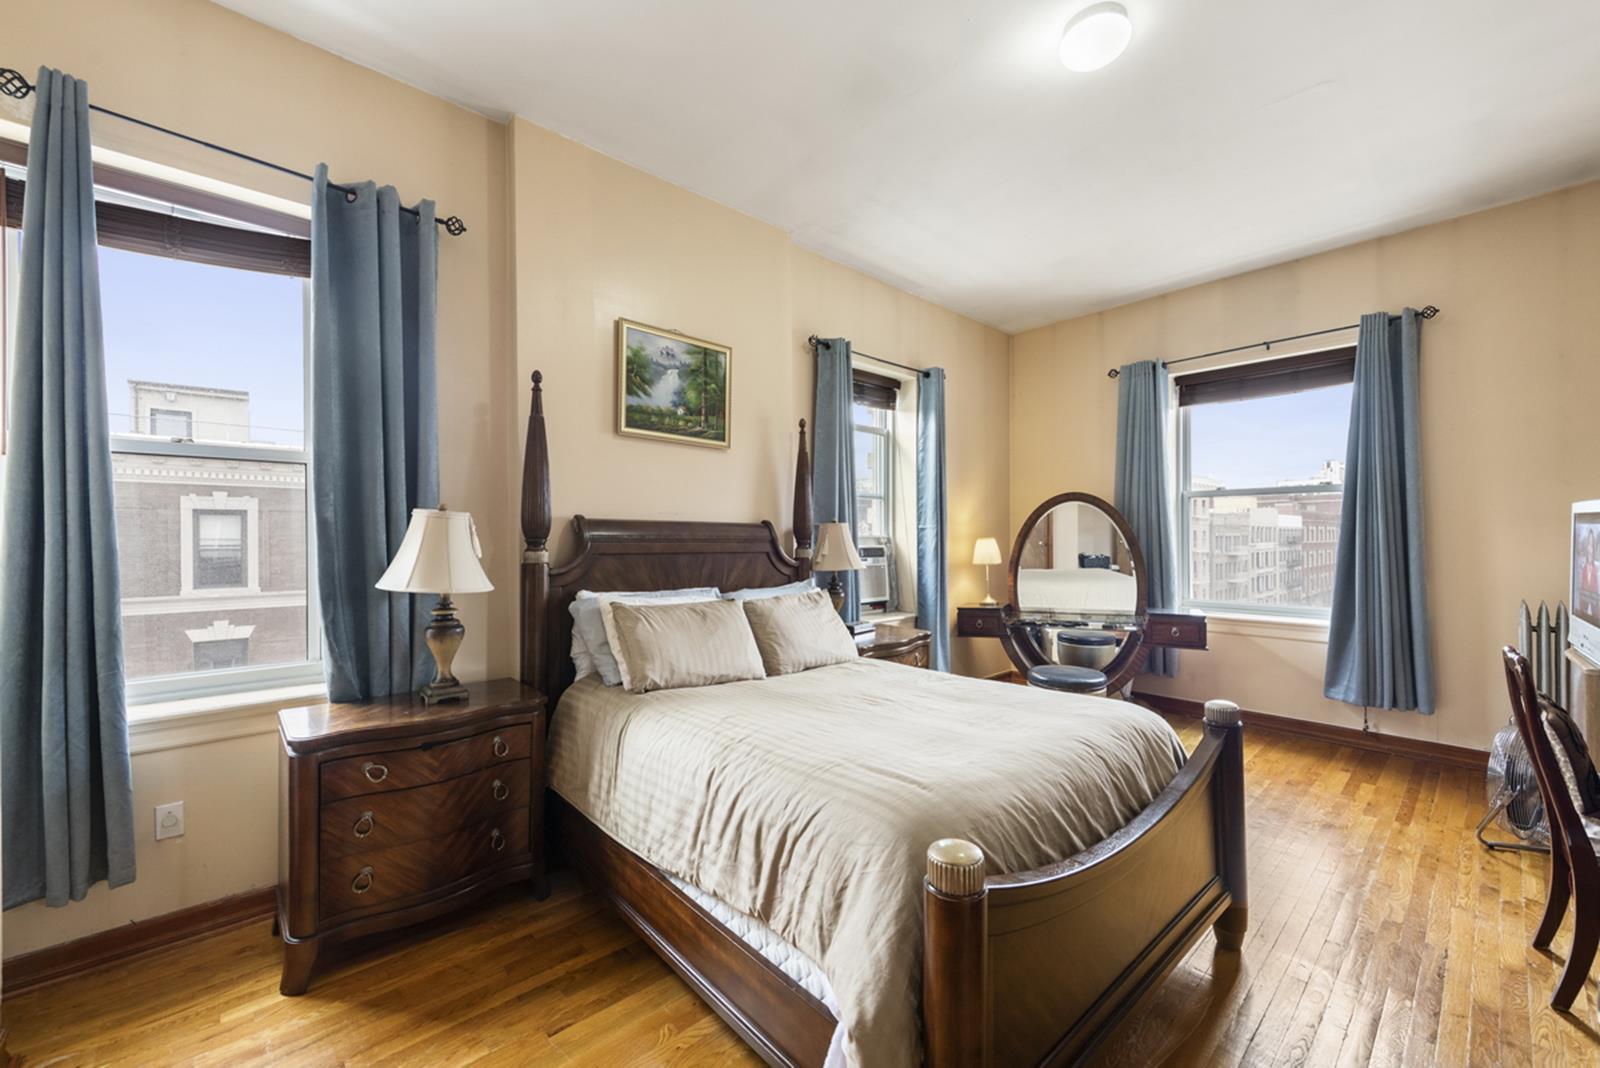 1855 Adam Clayton Powell Blvd. West Harlem New York NY 10026